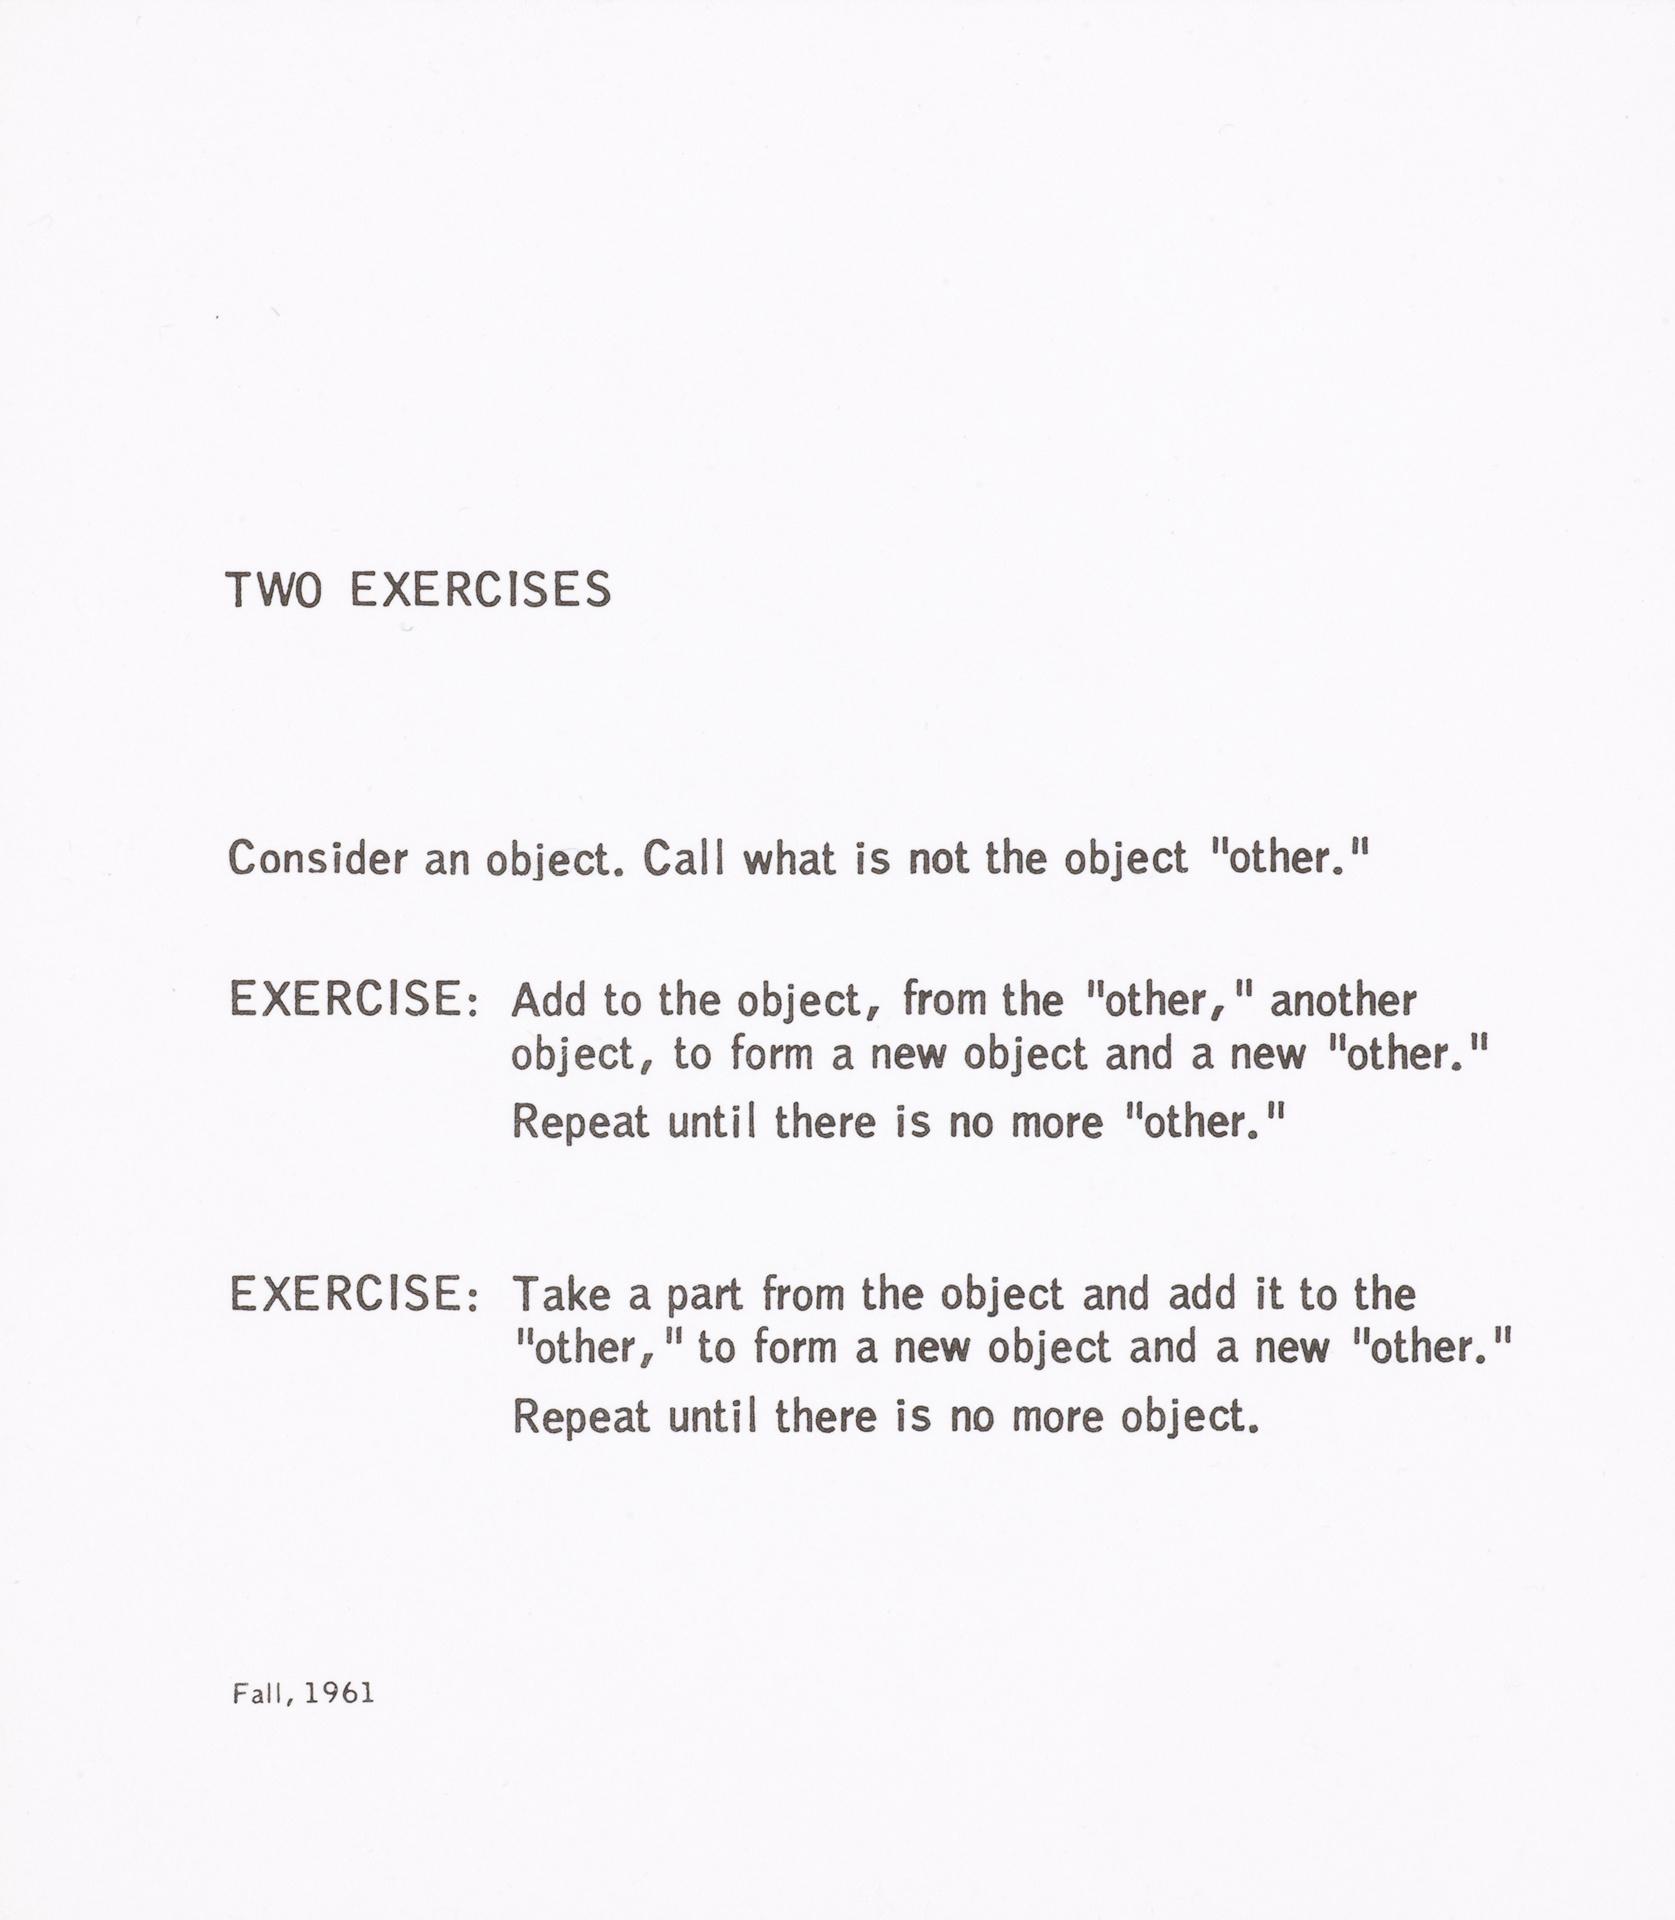 017 Lyric Essays Wac 7604 Awesome Essay Examples Full